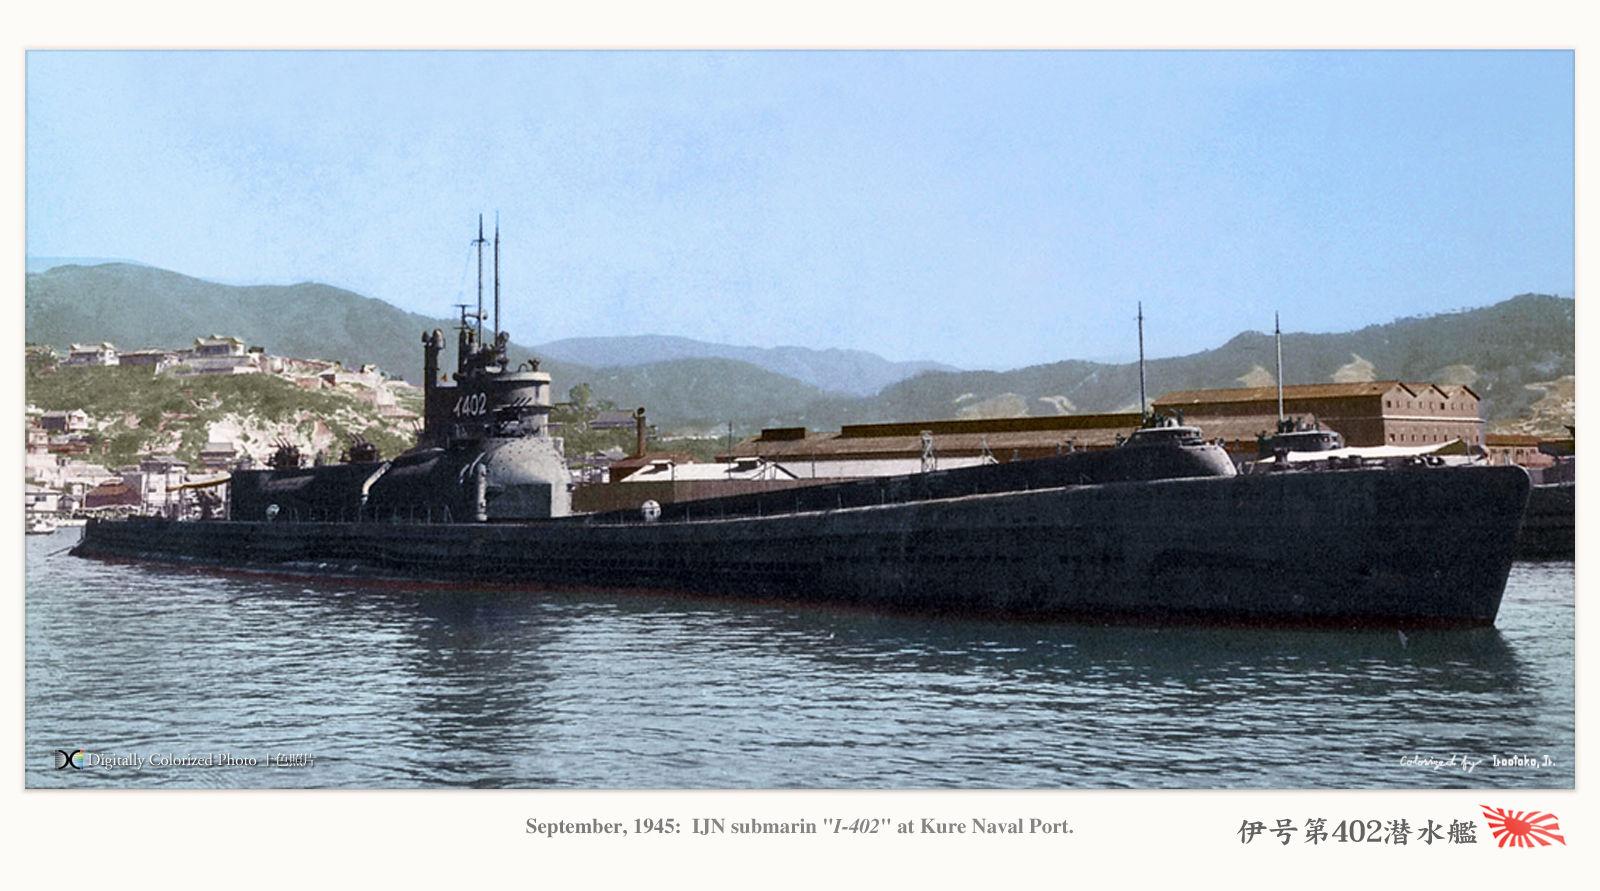 I401 at Kure in September 1945